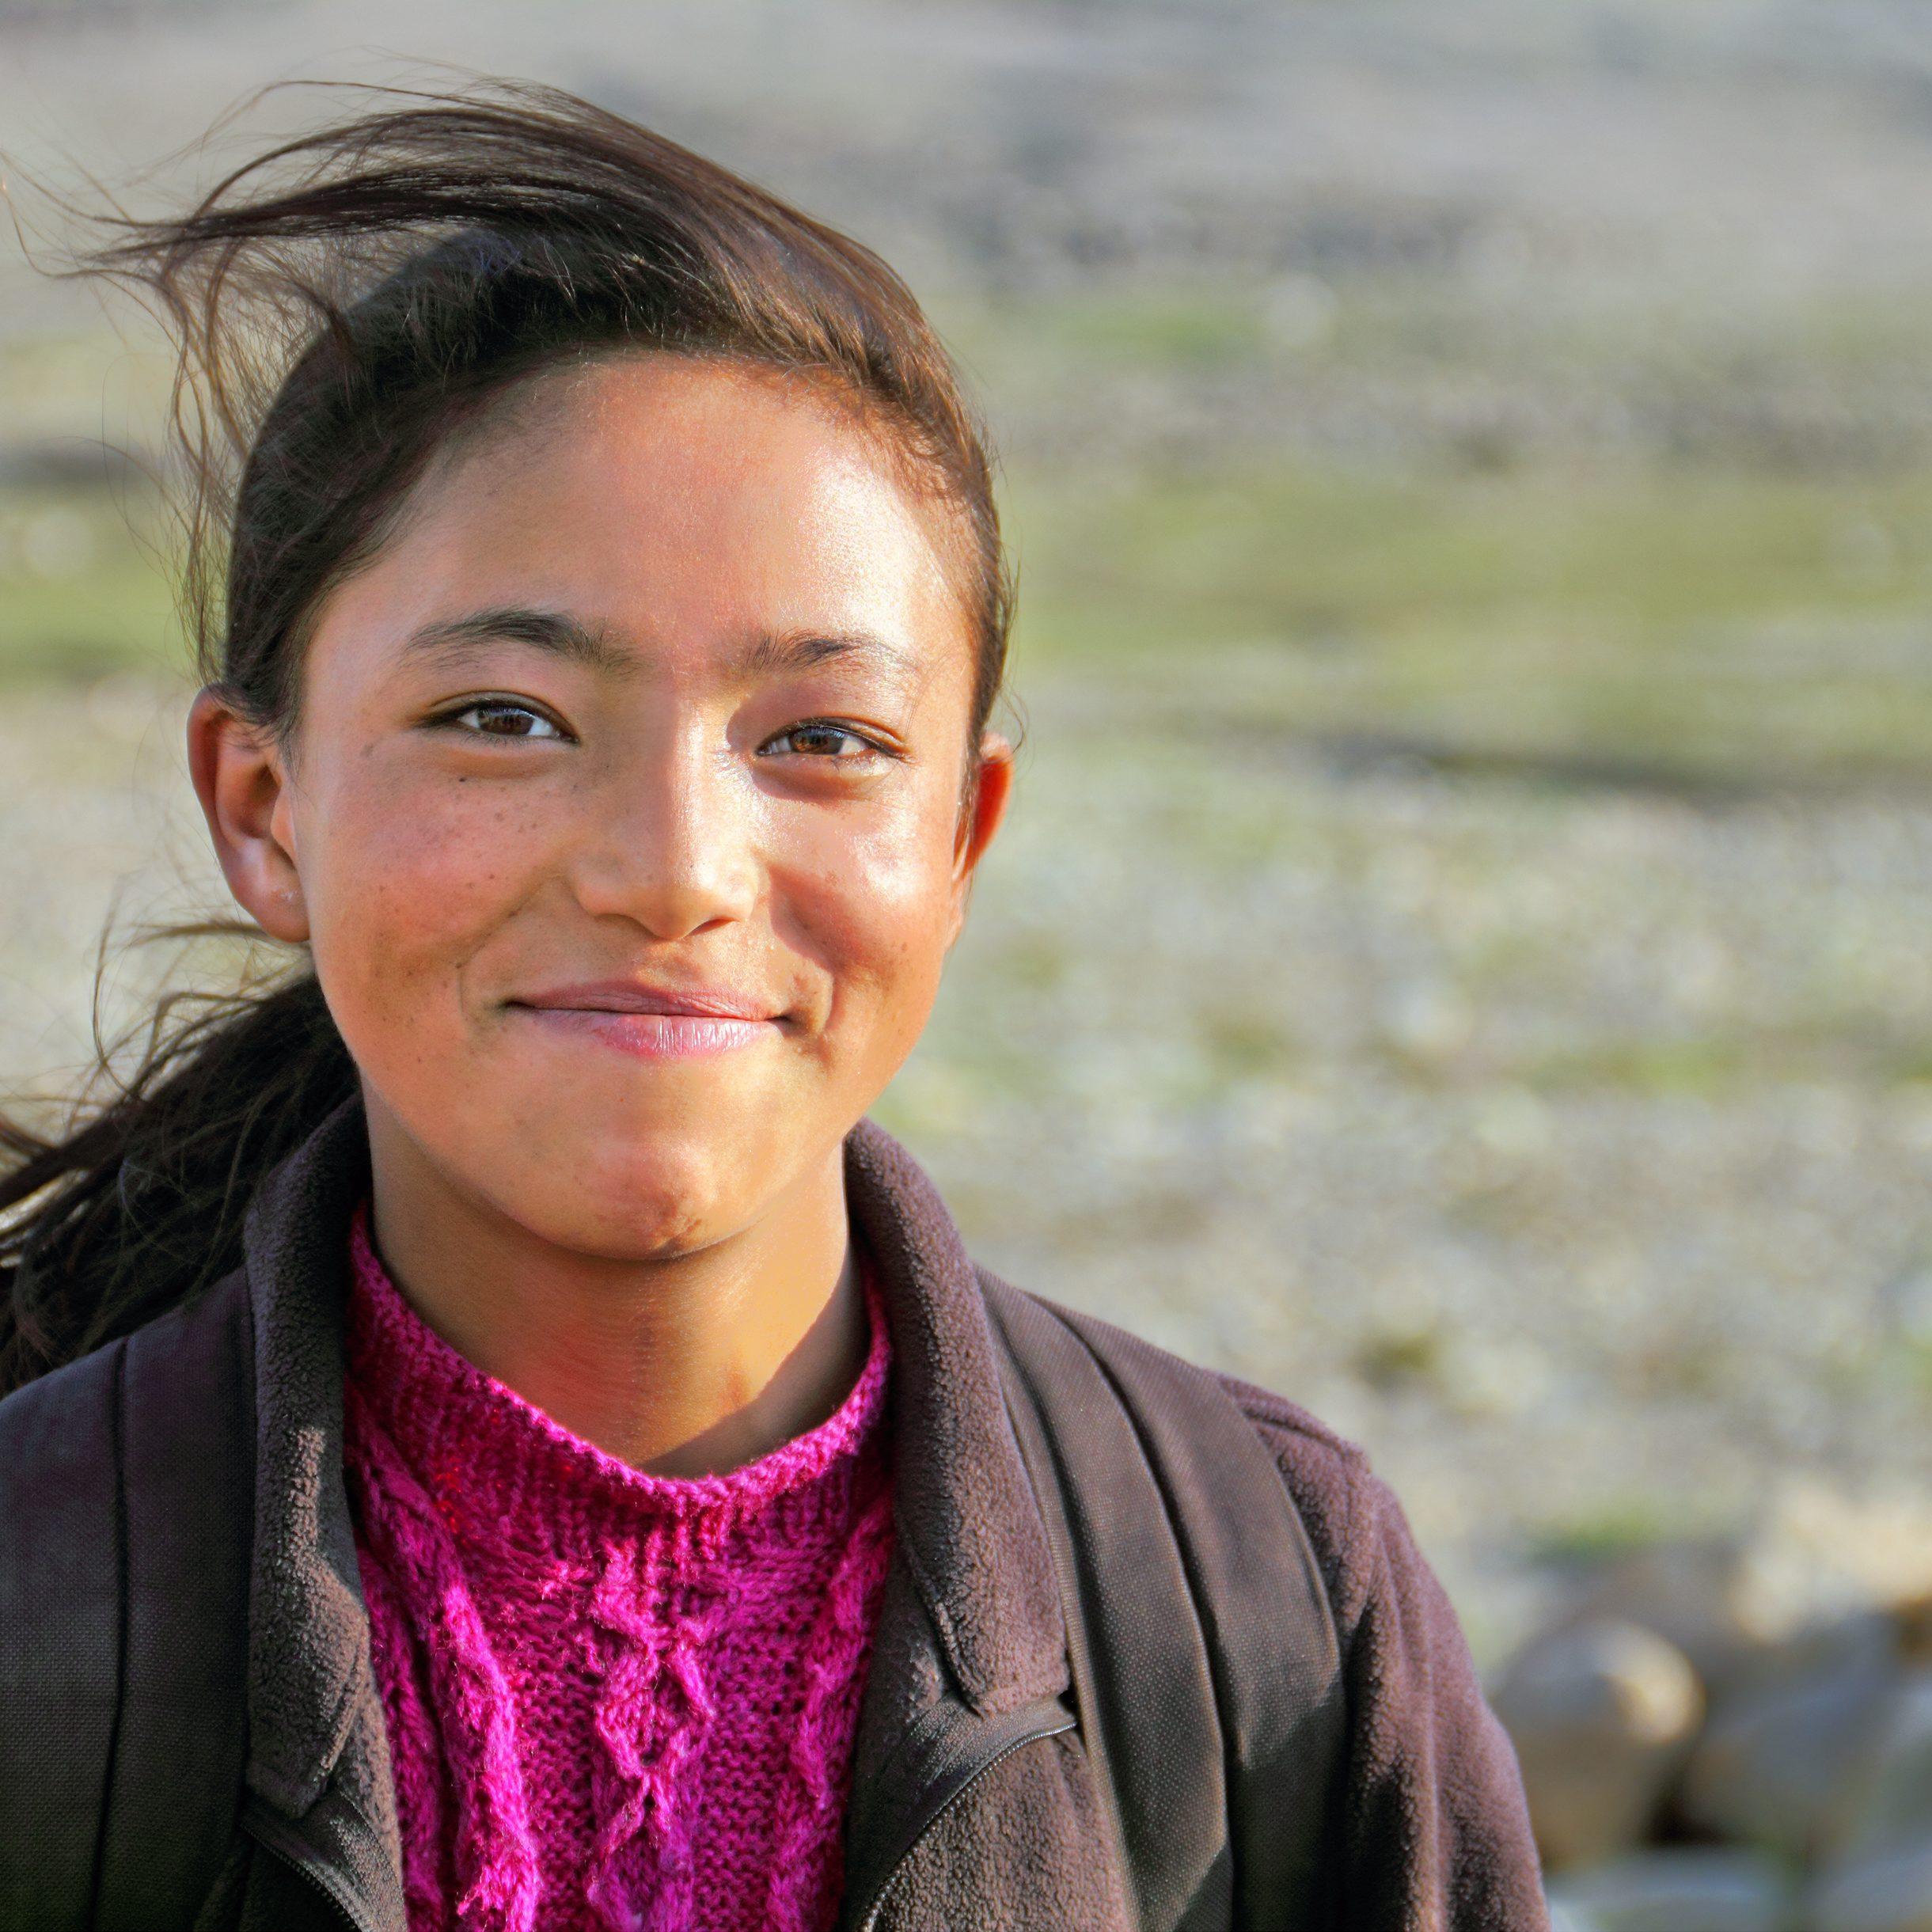 shutterstock_260394641_tibetansk_jente